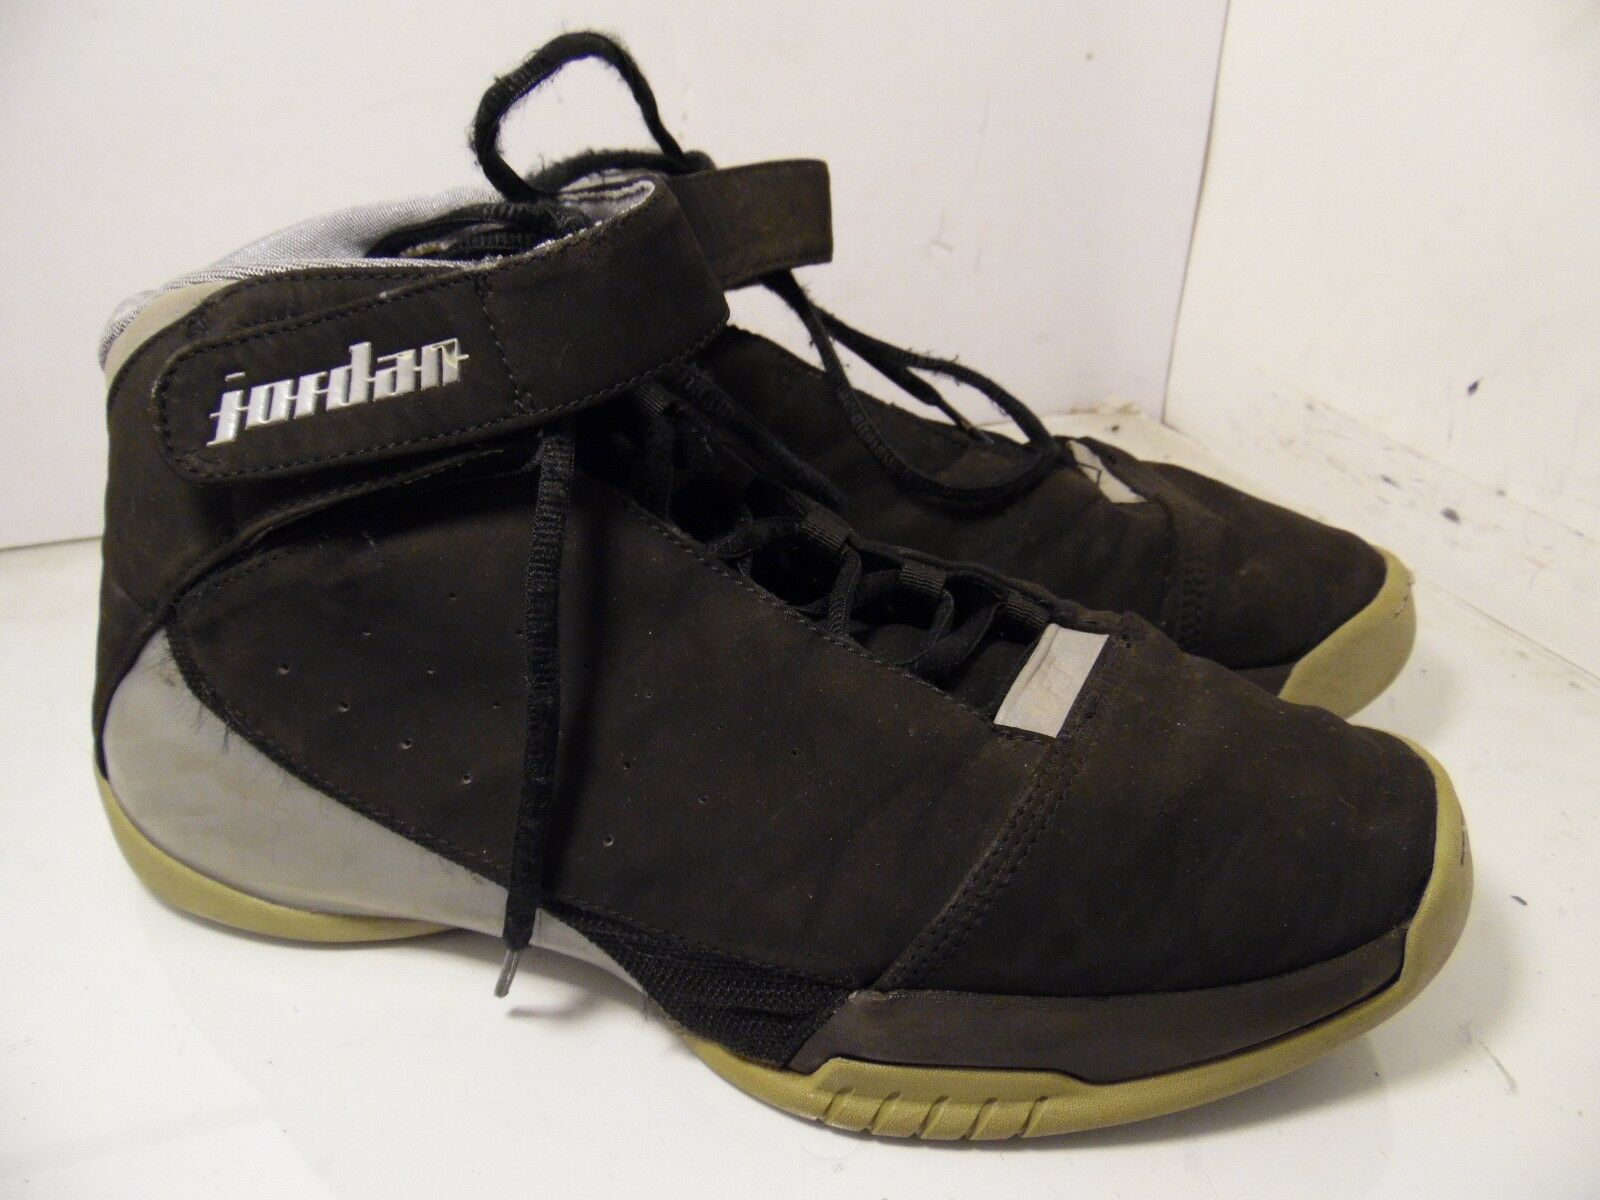 promo code 9af43 23ca5 311868 002 002 002 Nike Jordan Team Strong (black stealth) Sneaker Hi Top  Mens Sz 11.5 d55467